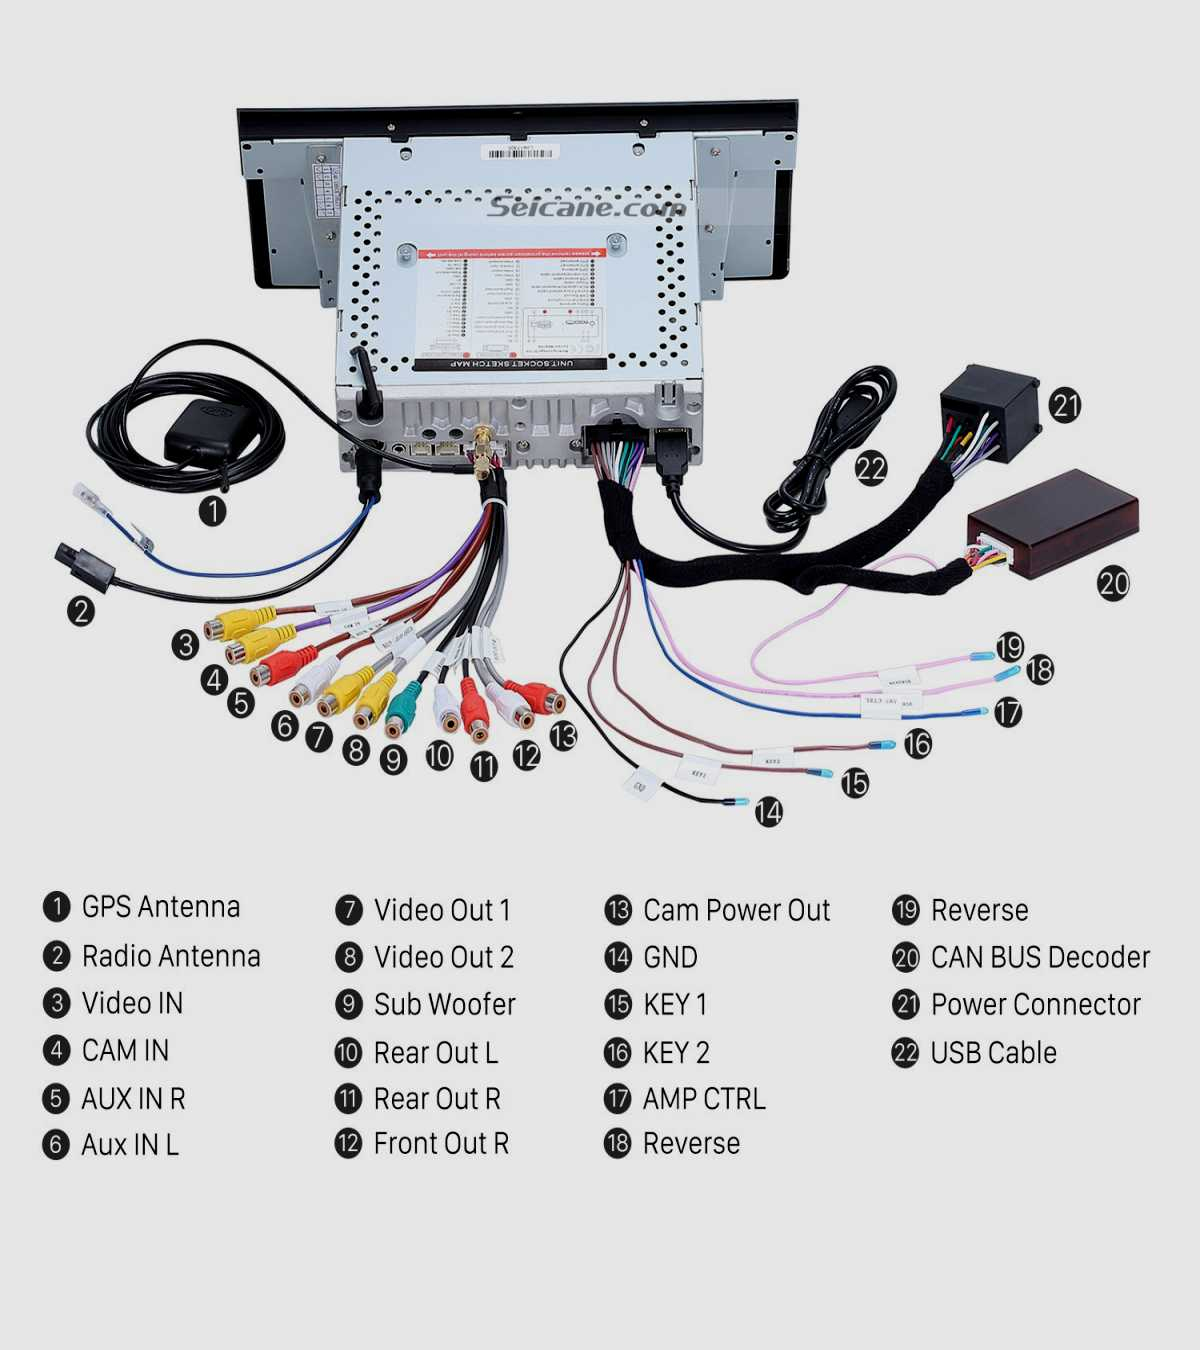 Kicker Subwoofer Wiring Diagram Rockford Punch Subwoofer Wiring - Kicker Wiring Diagram